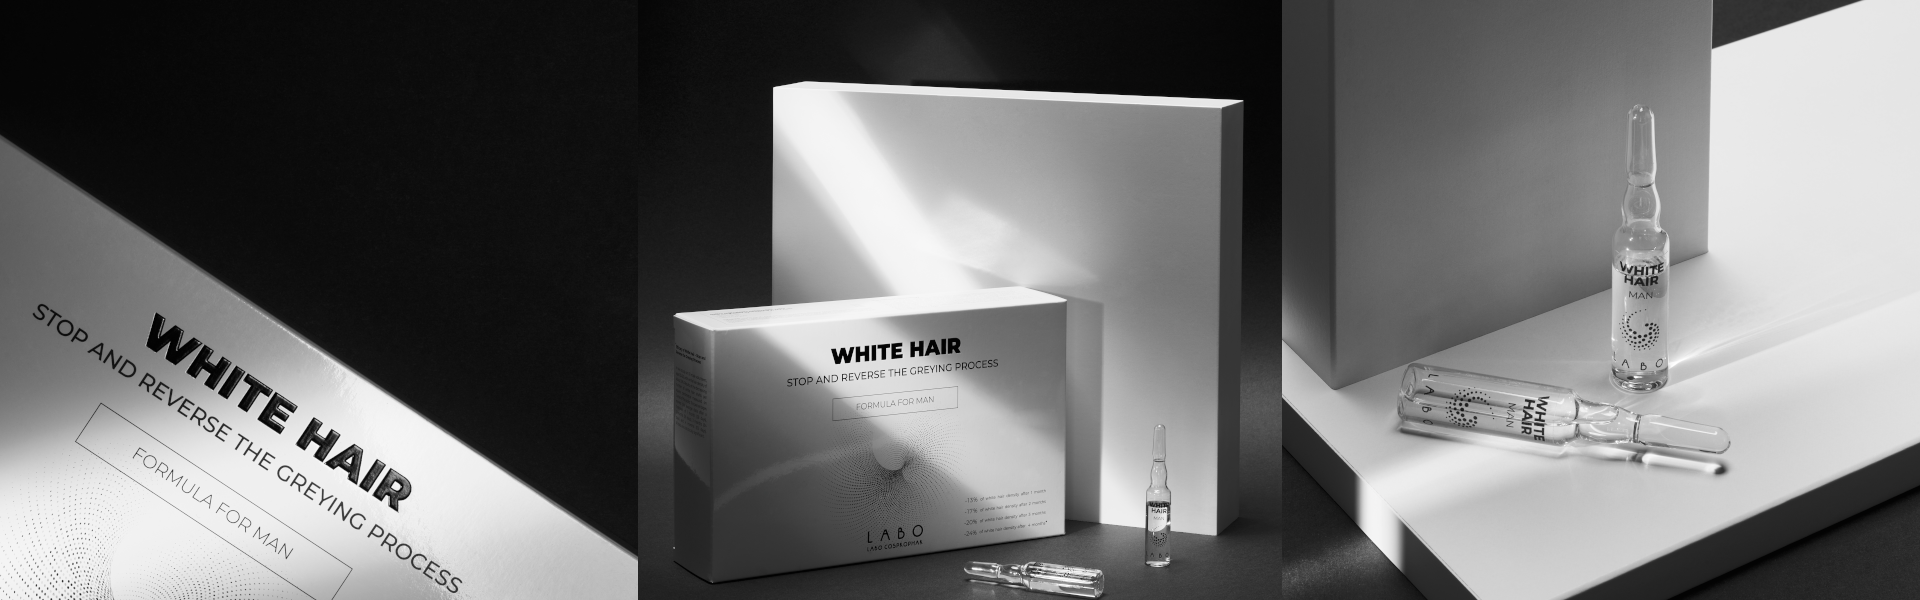 WHITE HAIR VENDOR PAGE